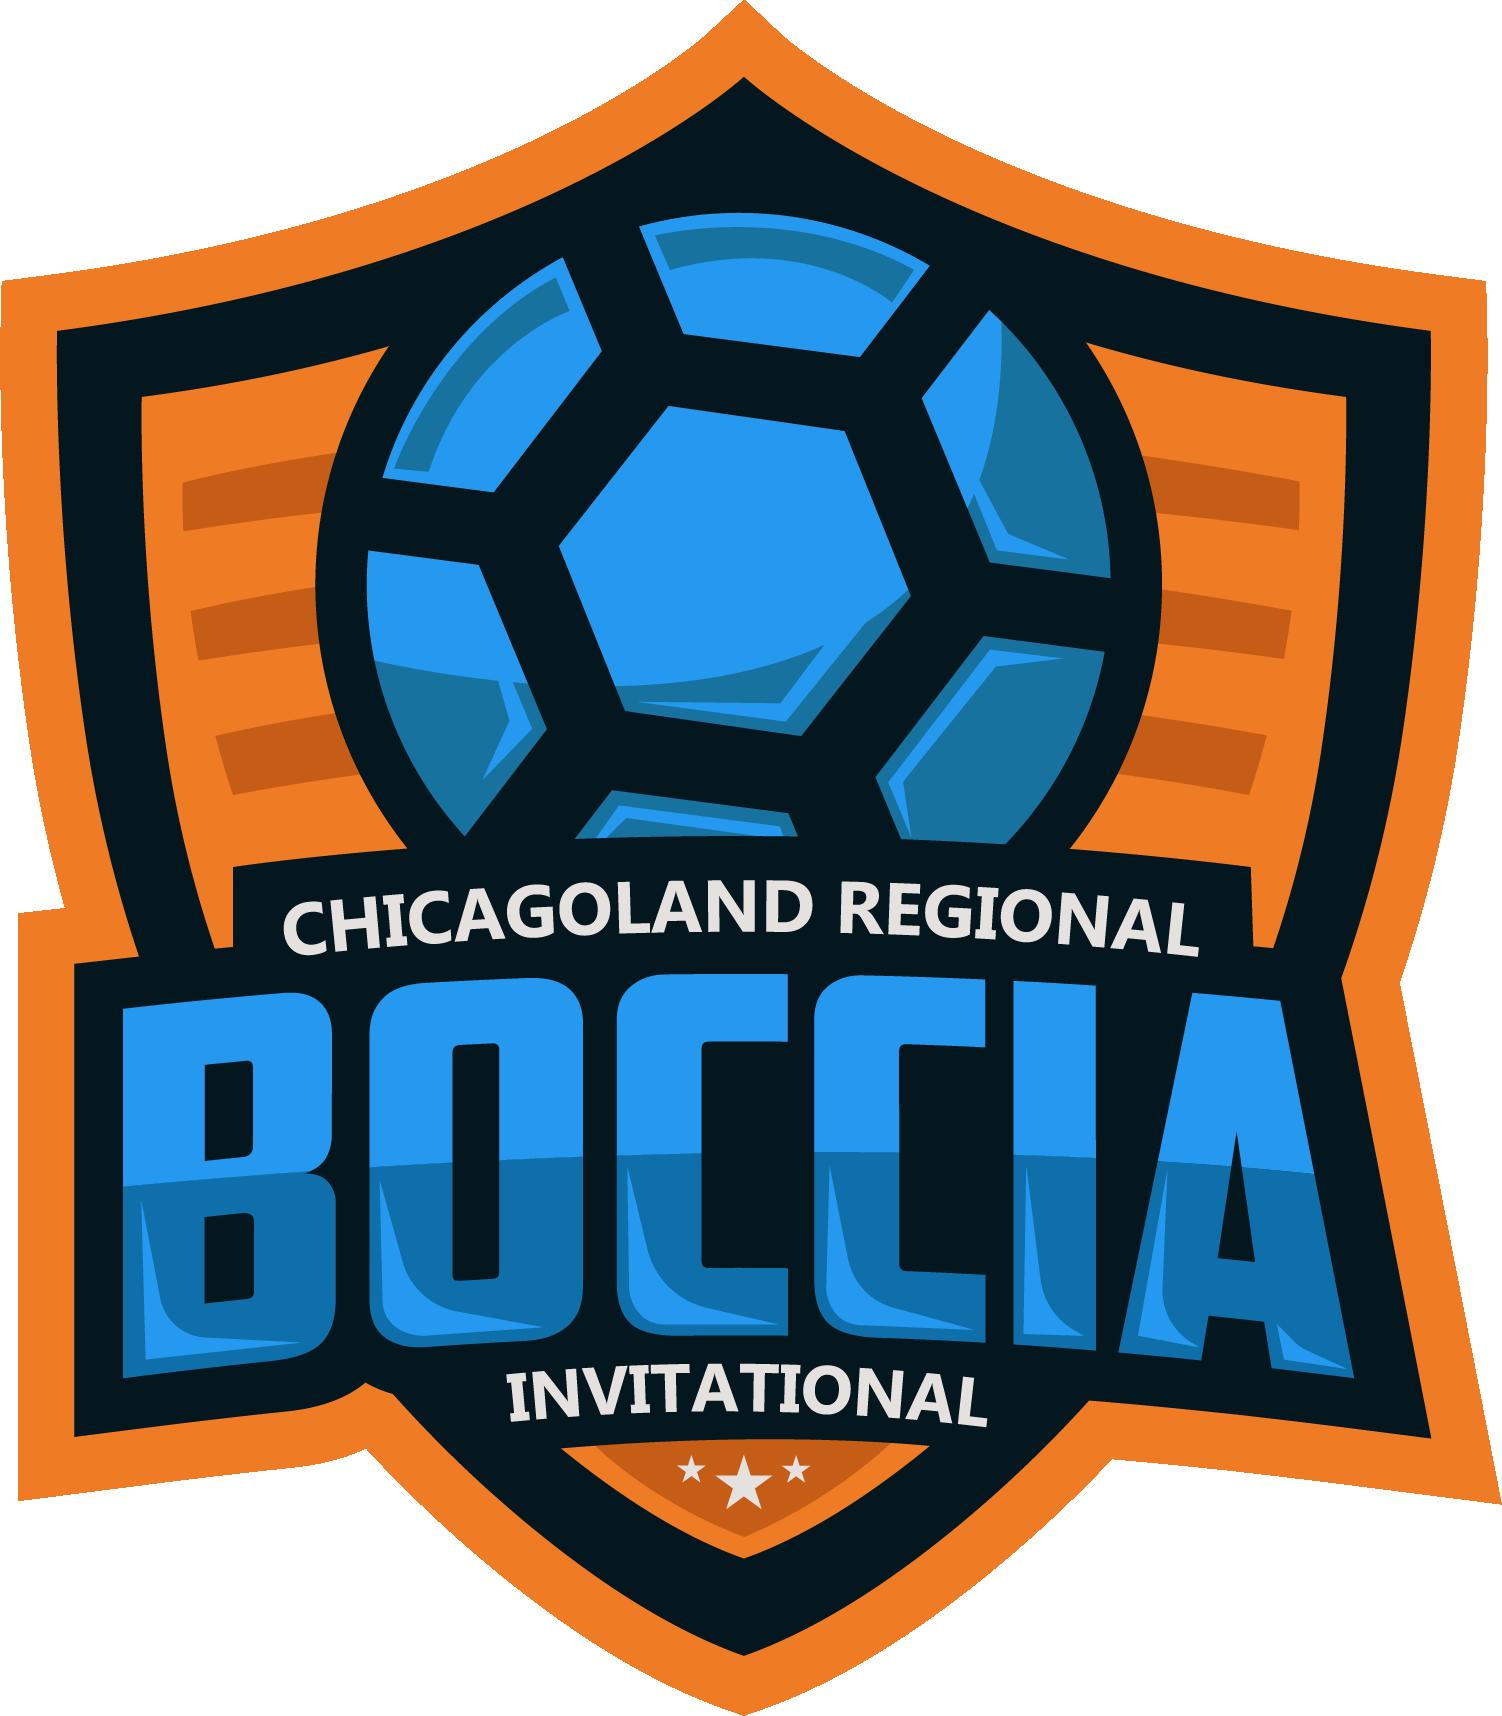 Chicagoland Regional Boccia Invitational logo. Links to event page.